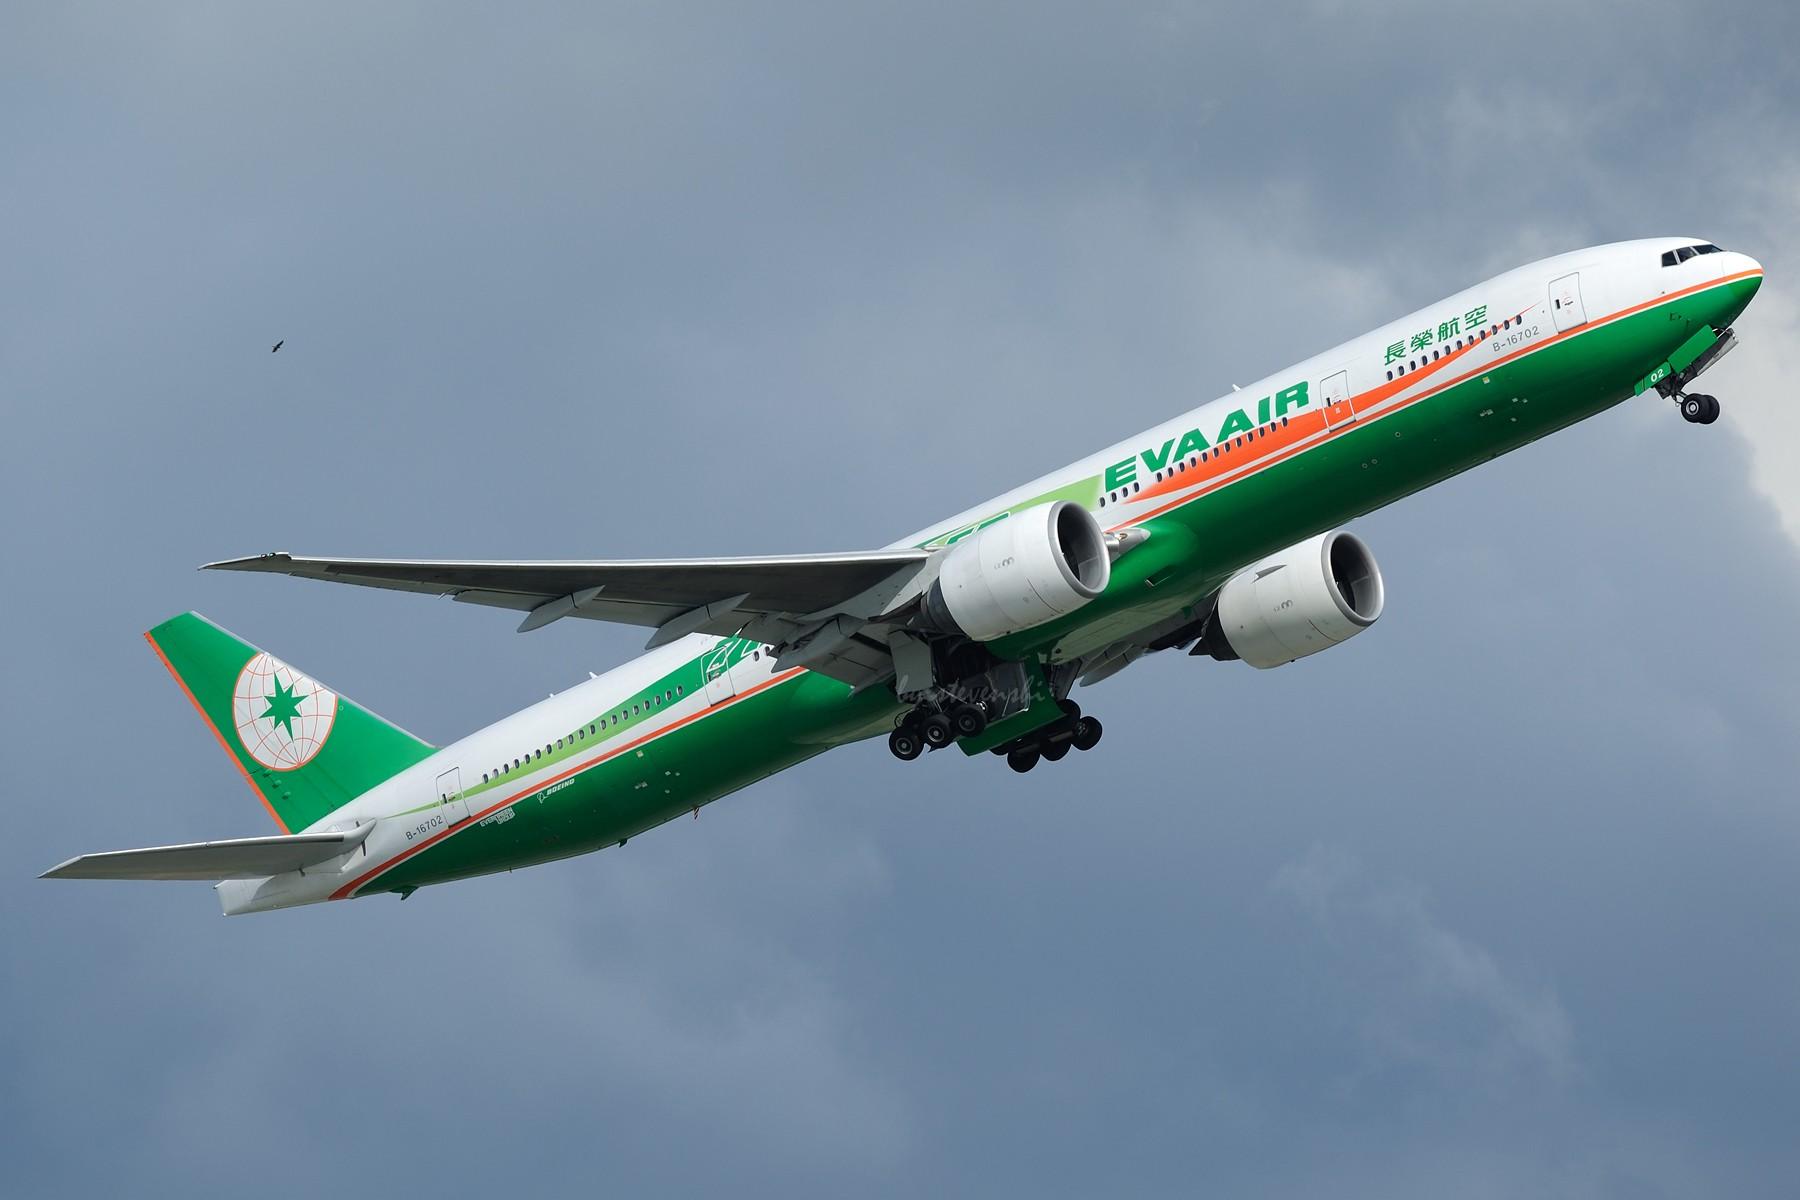 Re:【1800】上周末三天流窜的结果,有点惊喜,有点意外,也有失望 BOEING 777-300ER B-16702 中国香港赤?v角国际机场